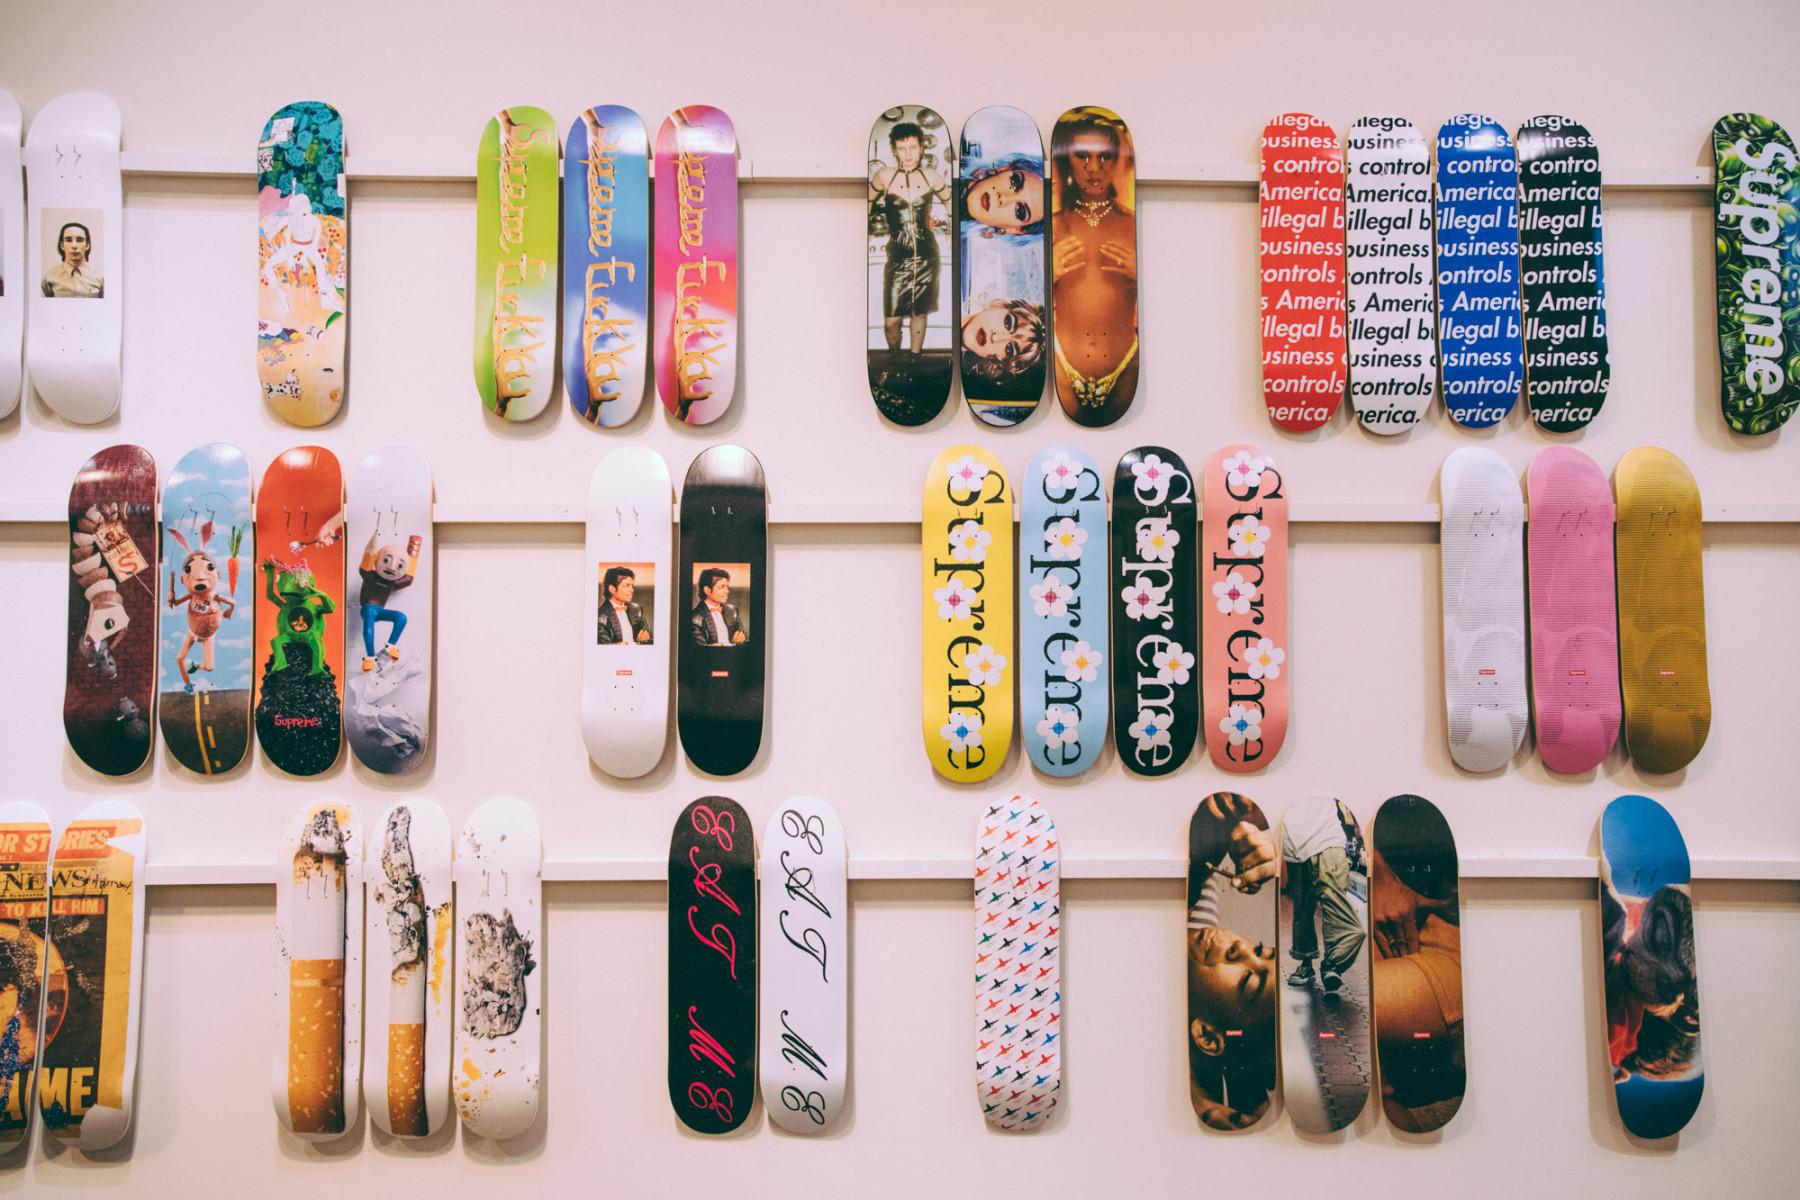 Sothebys-Supreme-Skate-Decks-17-1800x1200